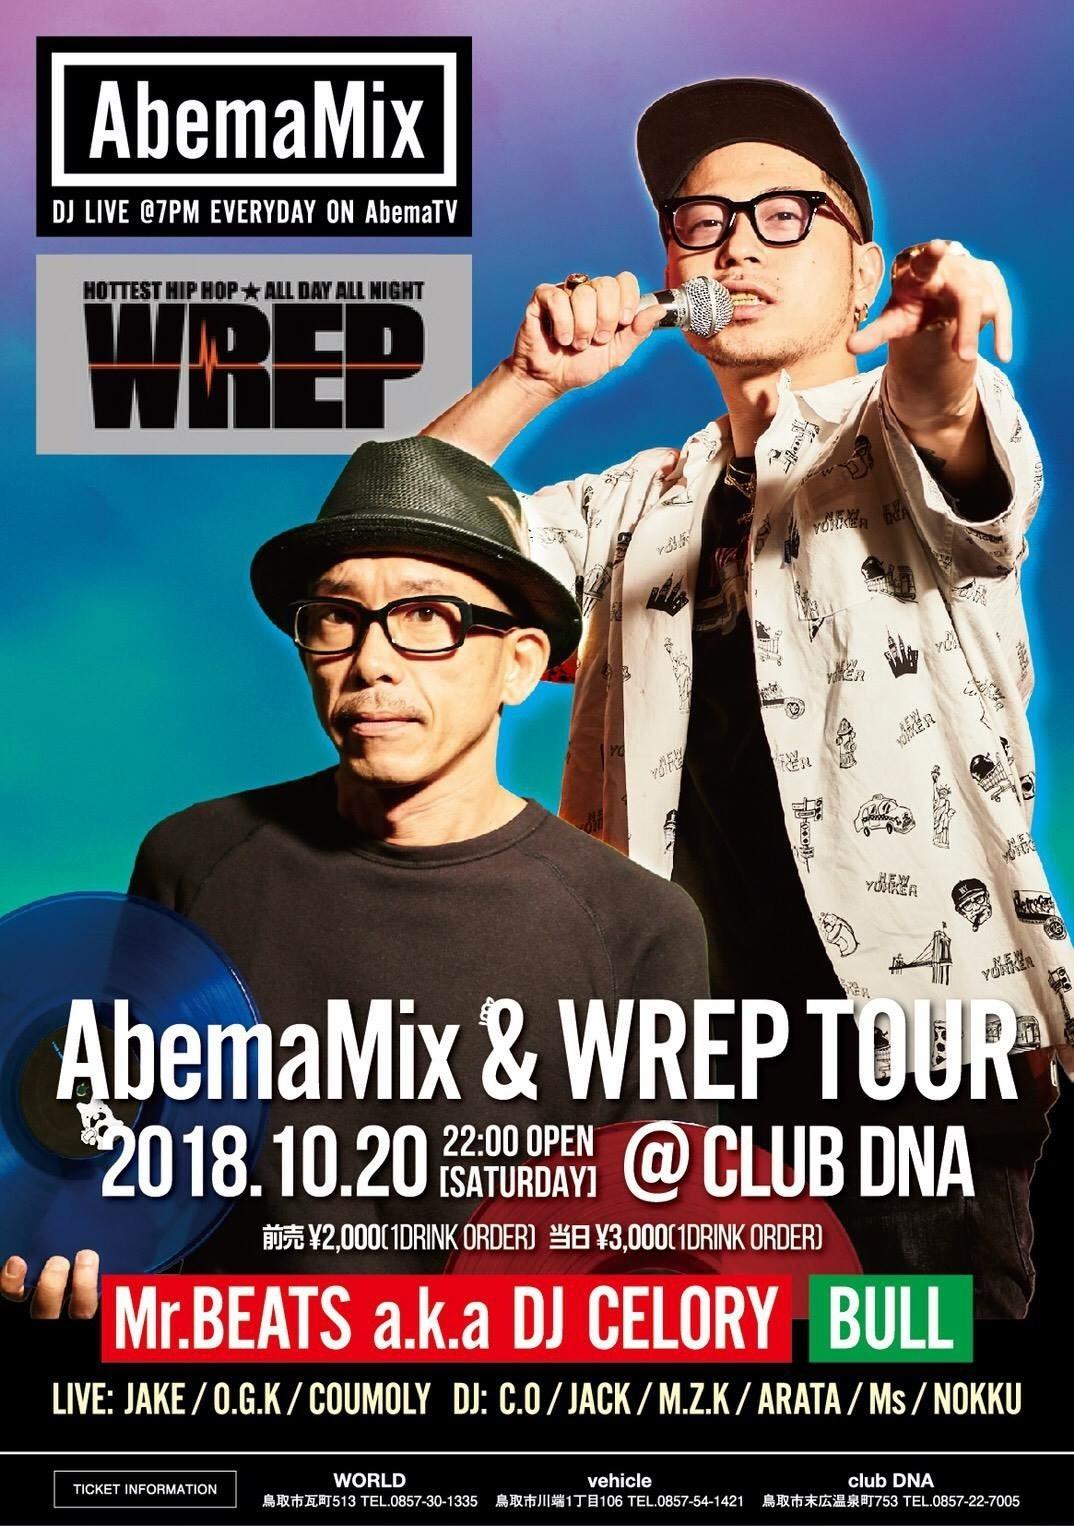 AbemaMix & WREP TOUR @DNA (2018.10.28) レポ_e0115904_00492434.jpg